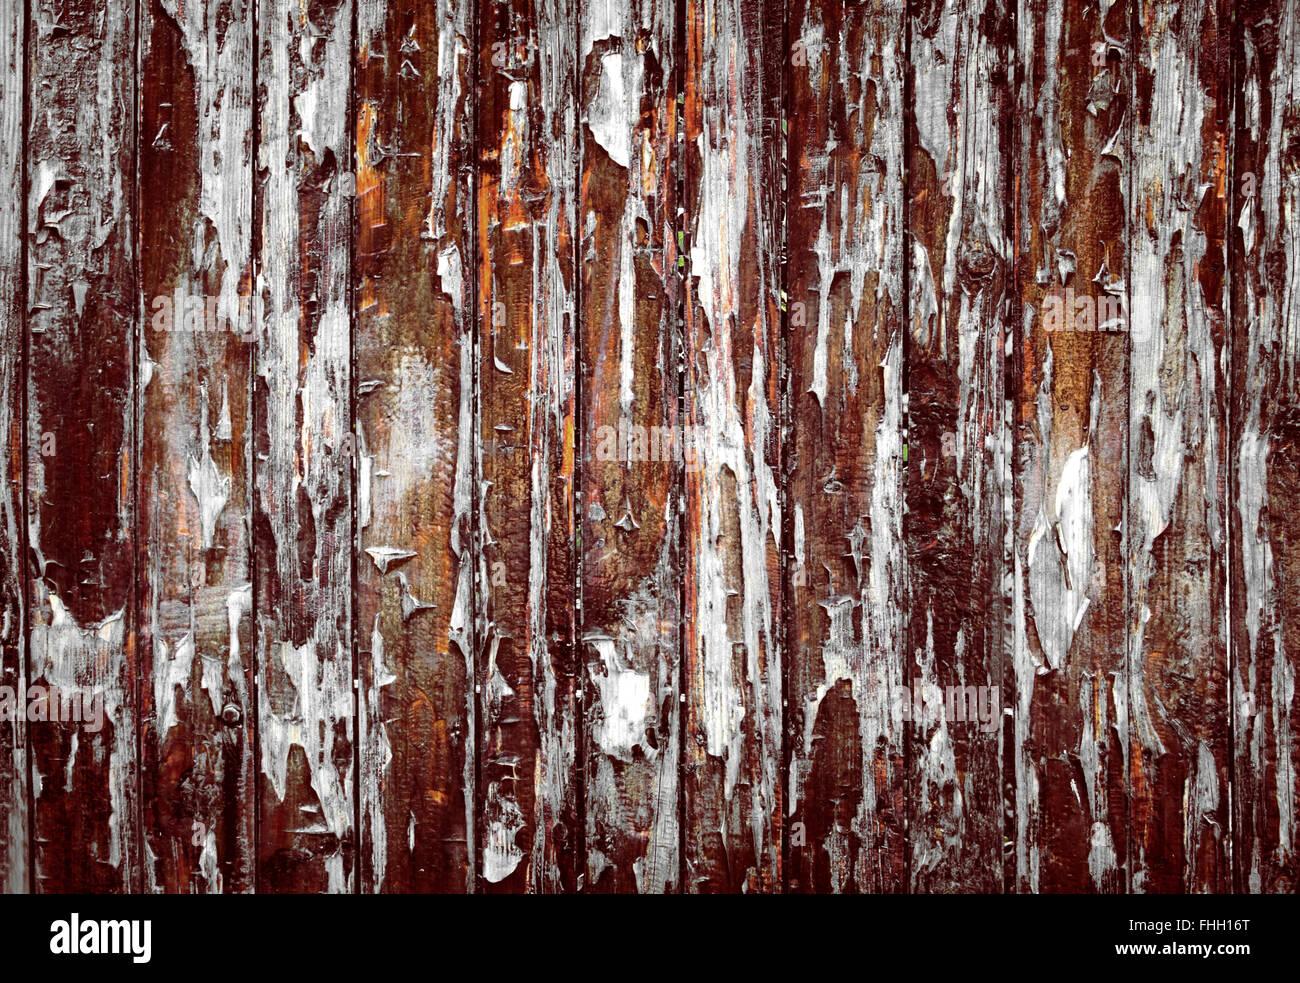 Wood grunge vintage texture background - Stock Image